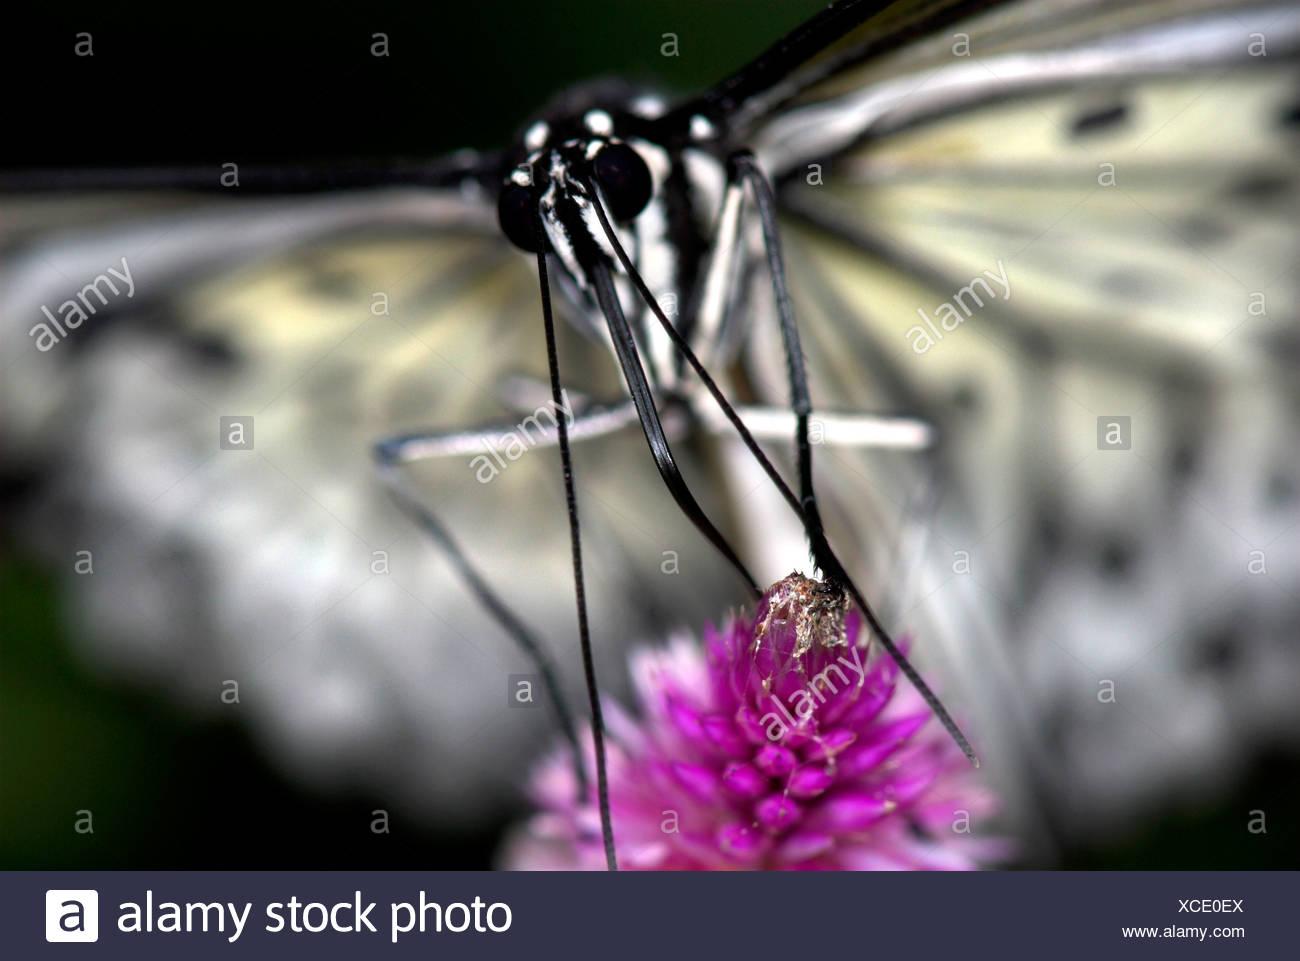 Tree Nymph ButterflyIdea leuconoe Asia Stock Photo